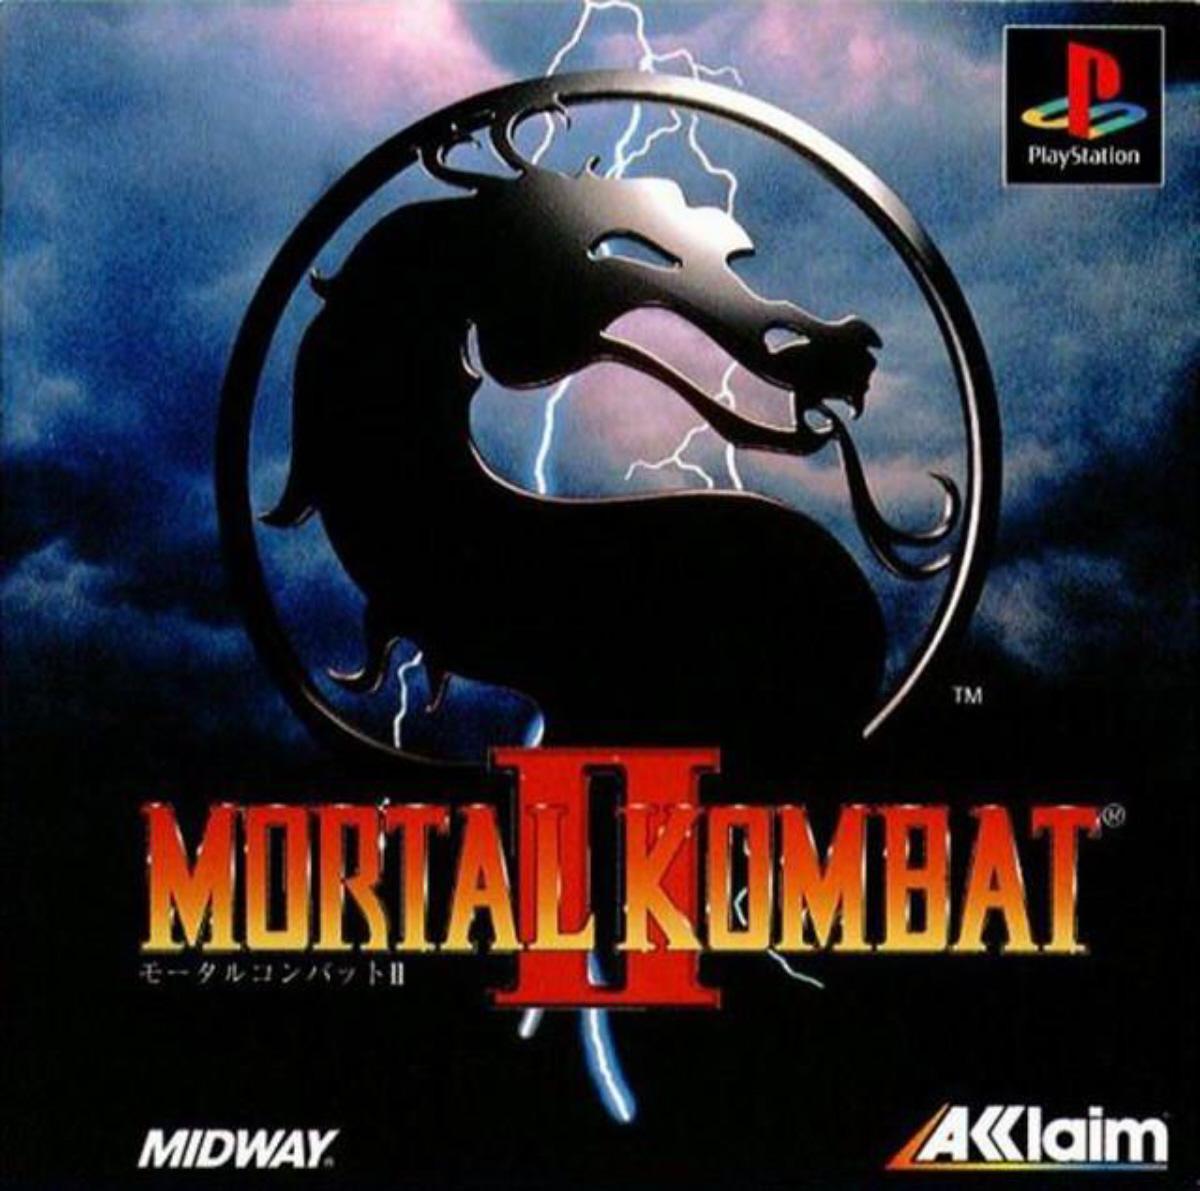 best version of mortal kombat 2